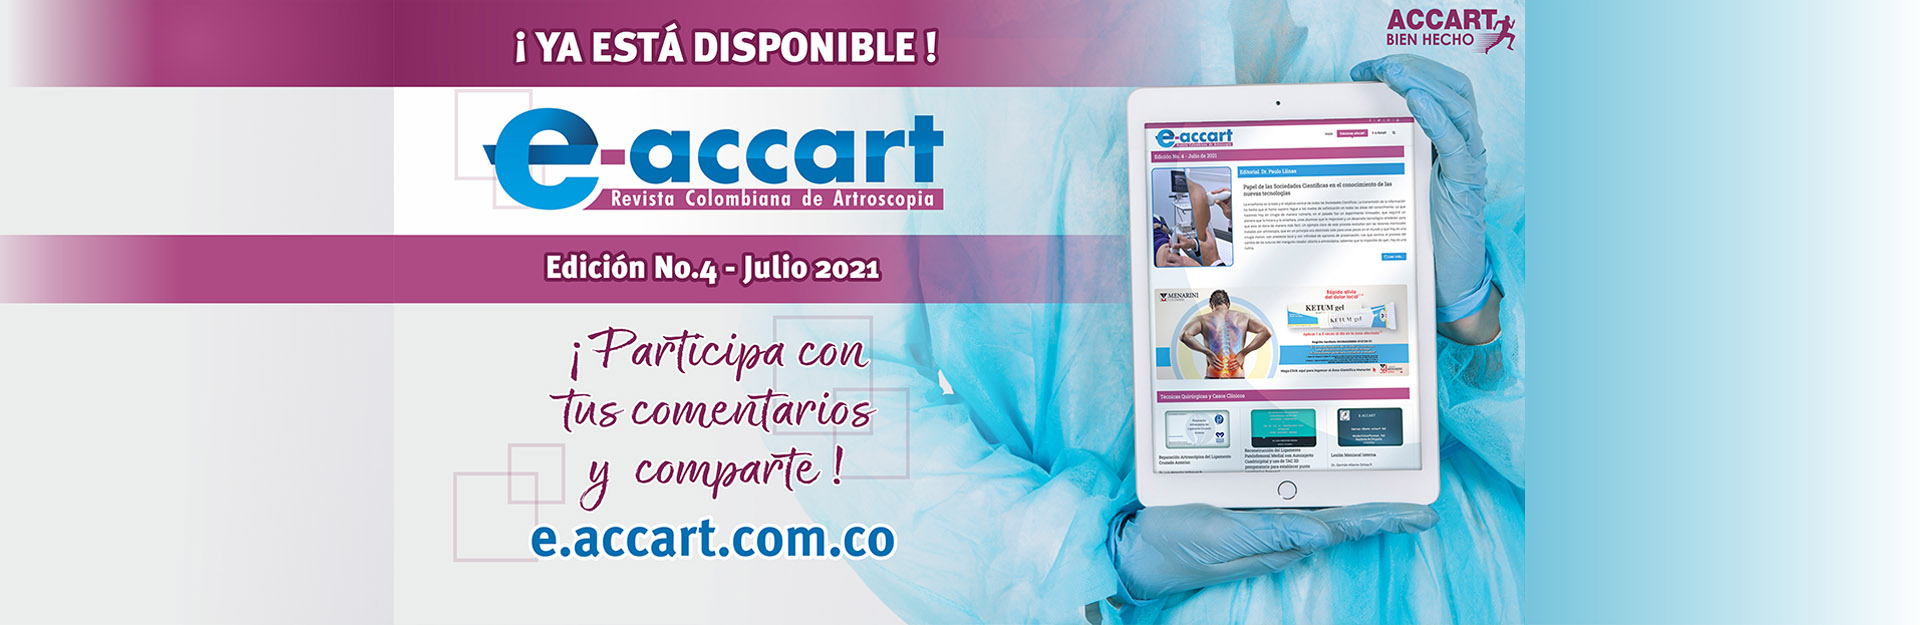 back_e-accart_04_disponible